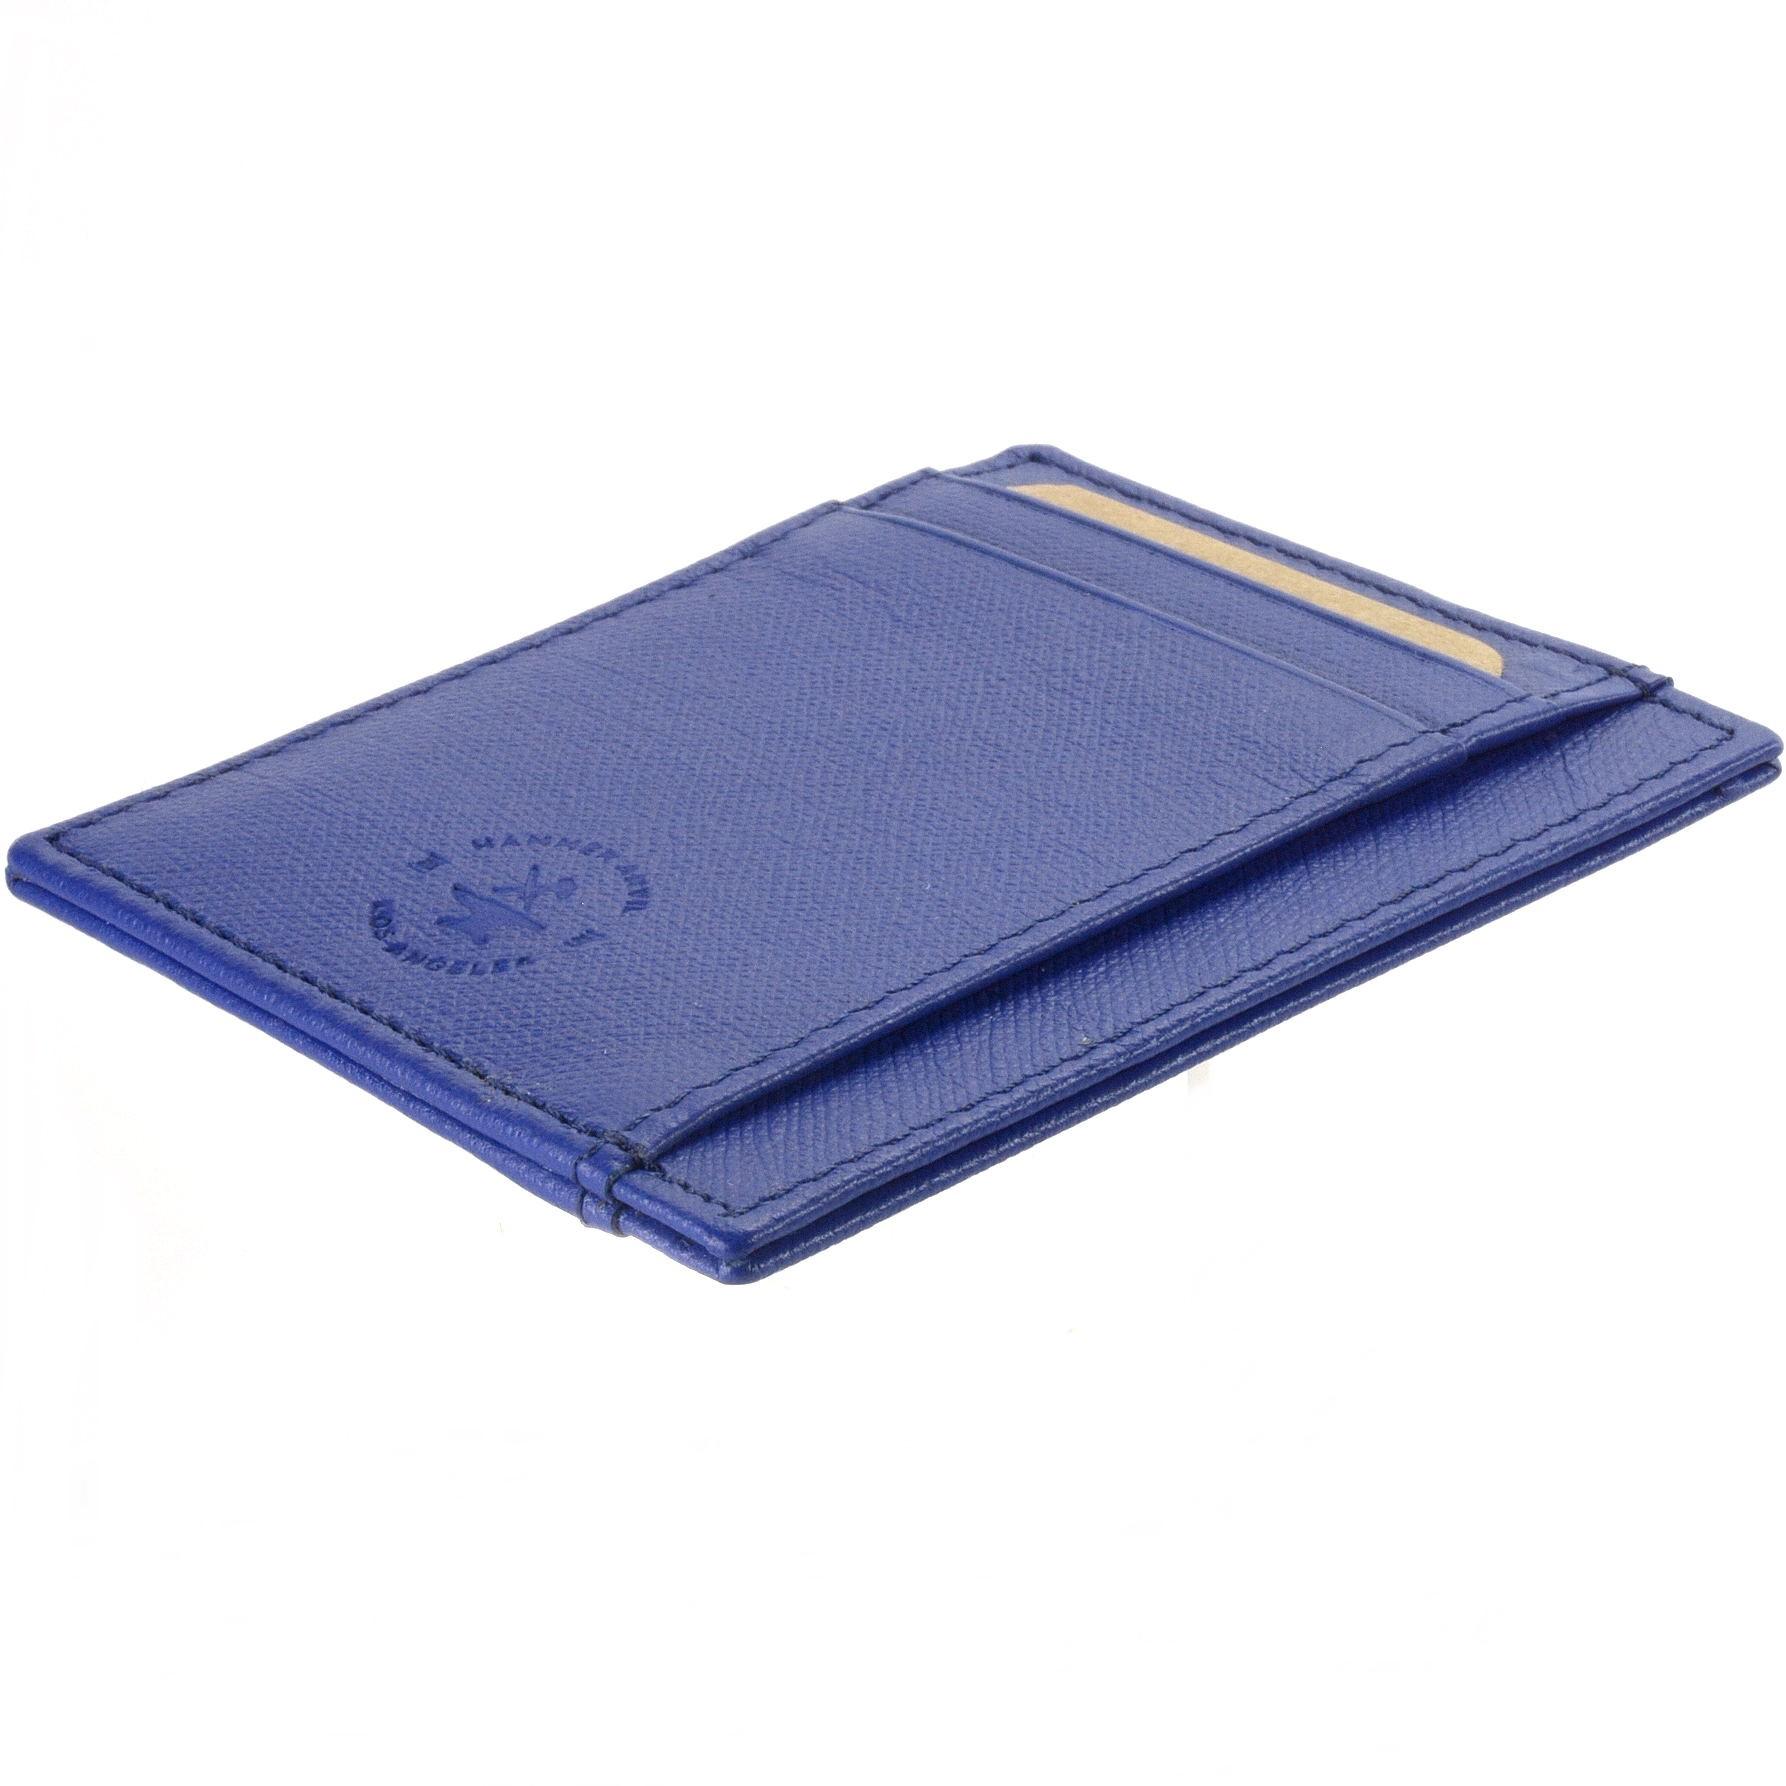 miniature 40 - Hammer-Anvil-Minimalist-Front-Pocket-Wallet-RFID-Blocking-Thin-Leather-Card-Case